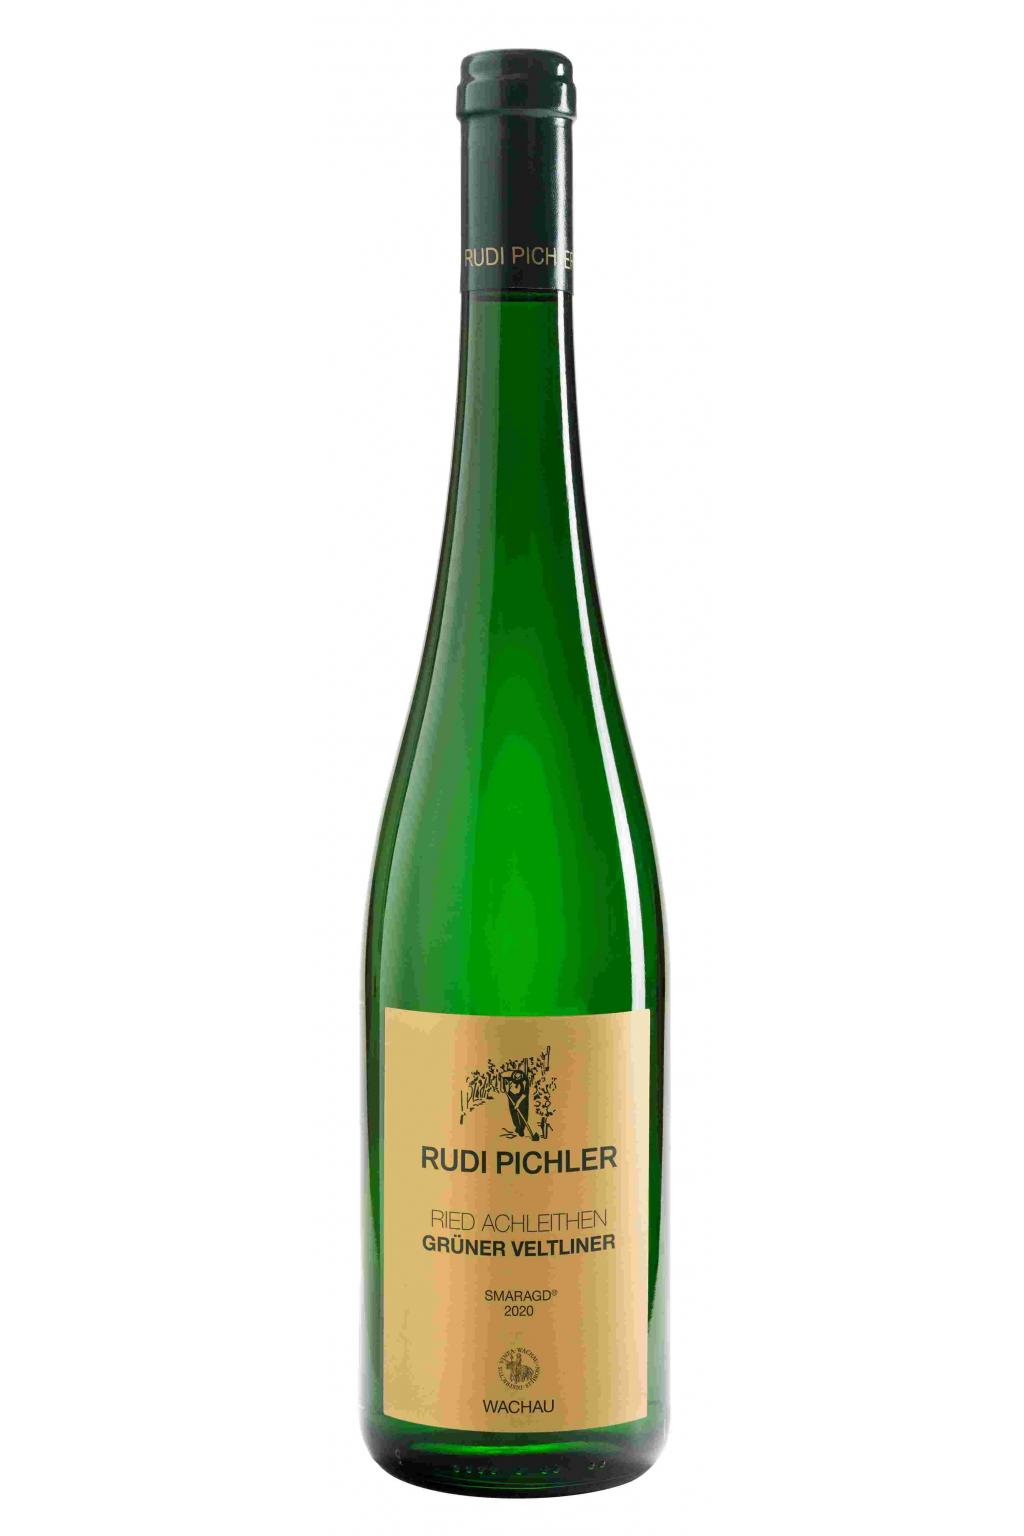 RudiPichler GV Ried Achleithen Smaragd 2020 web